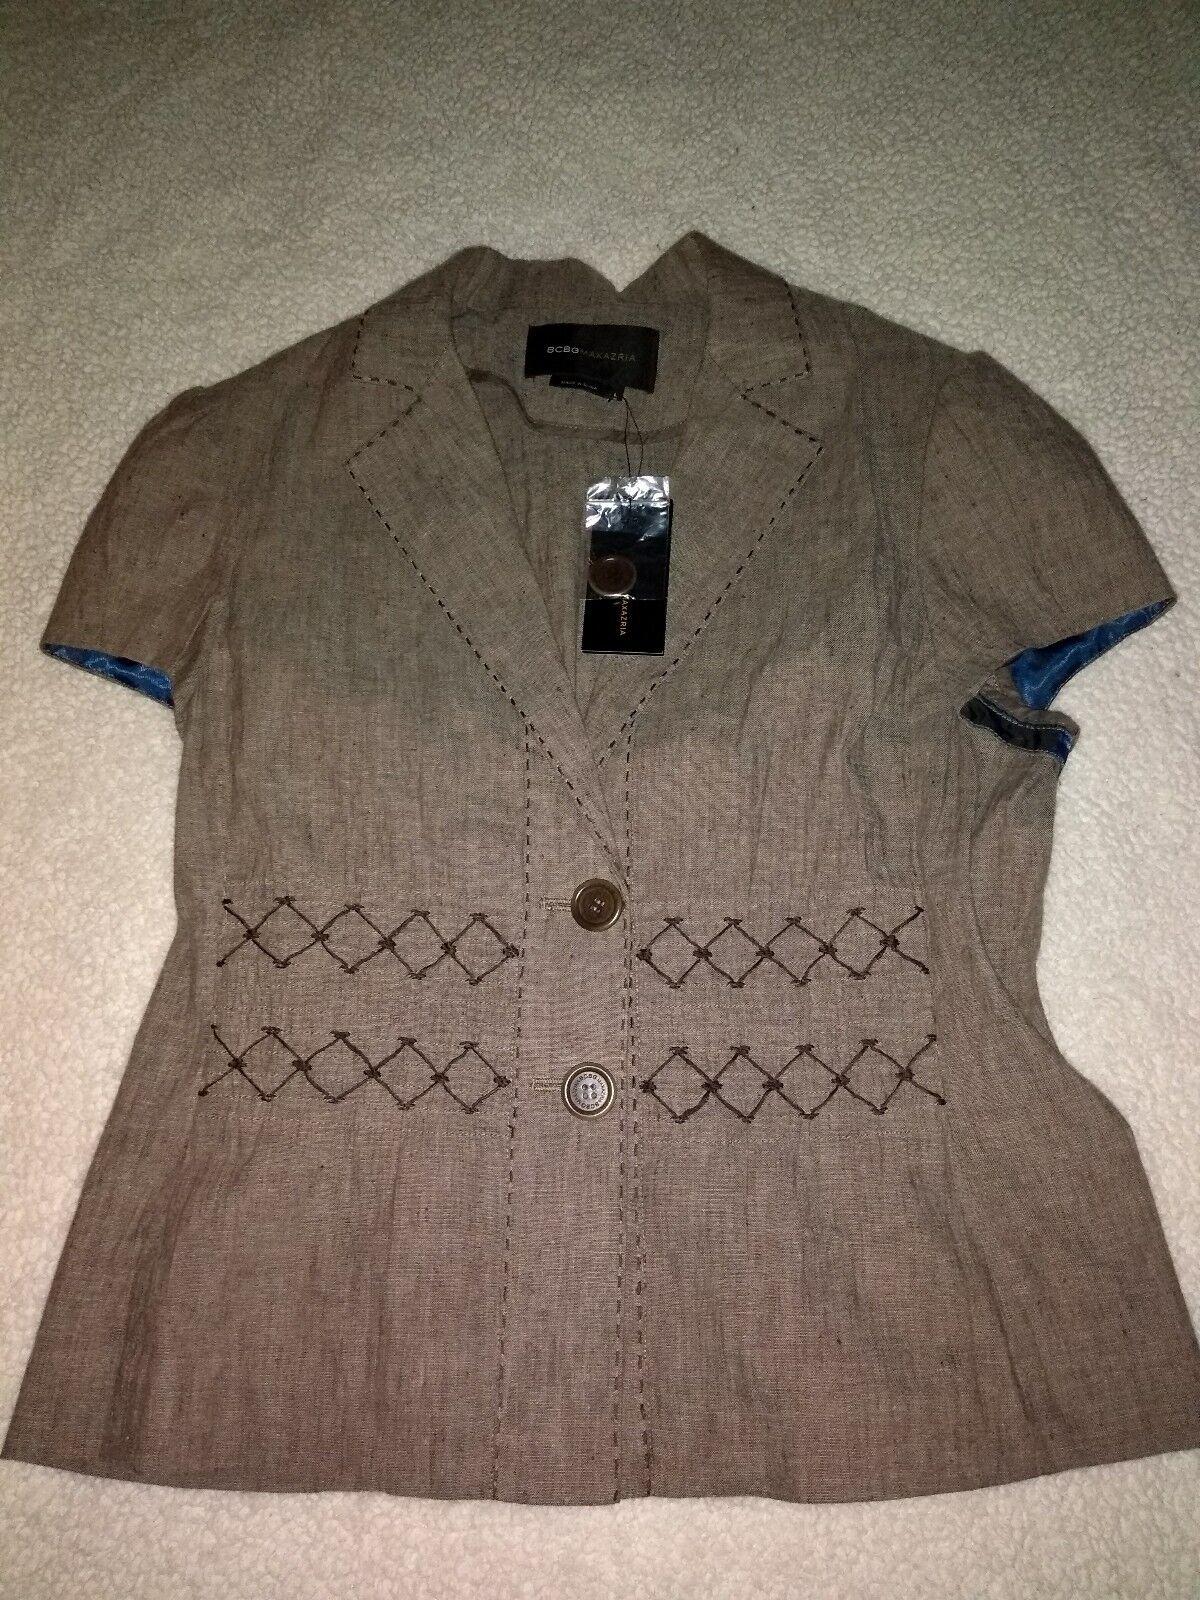 BCBGMAXAZARIA woven cardigan ( top) linen